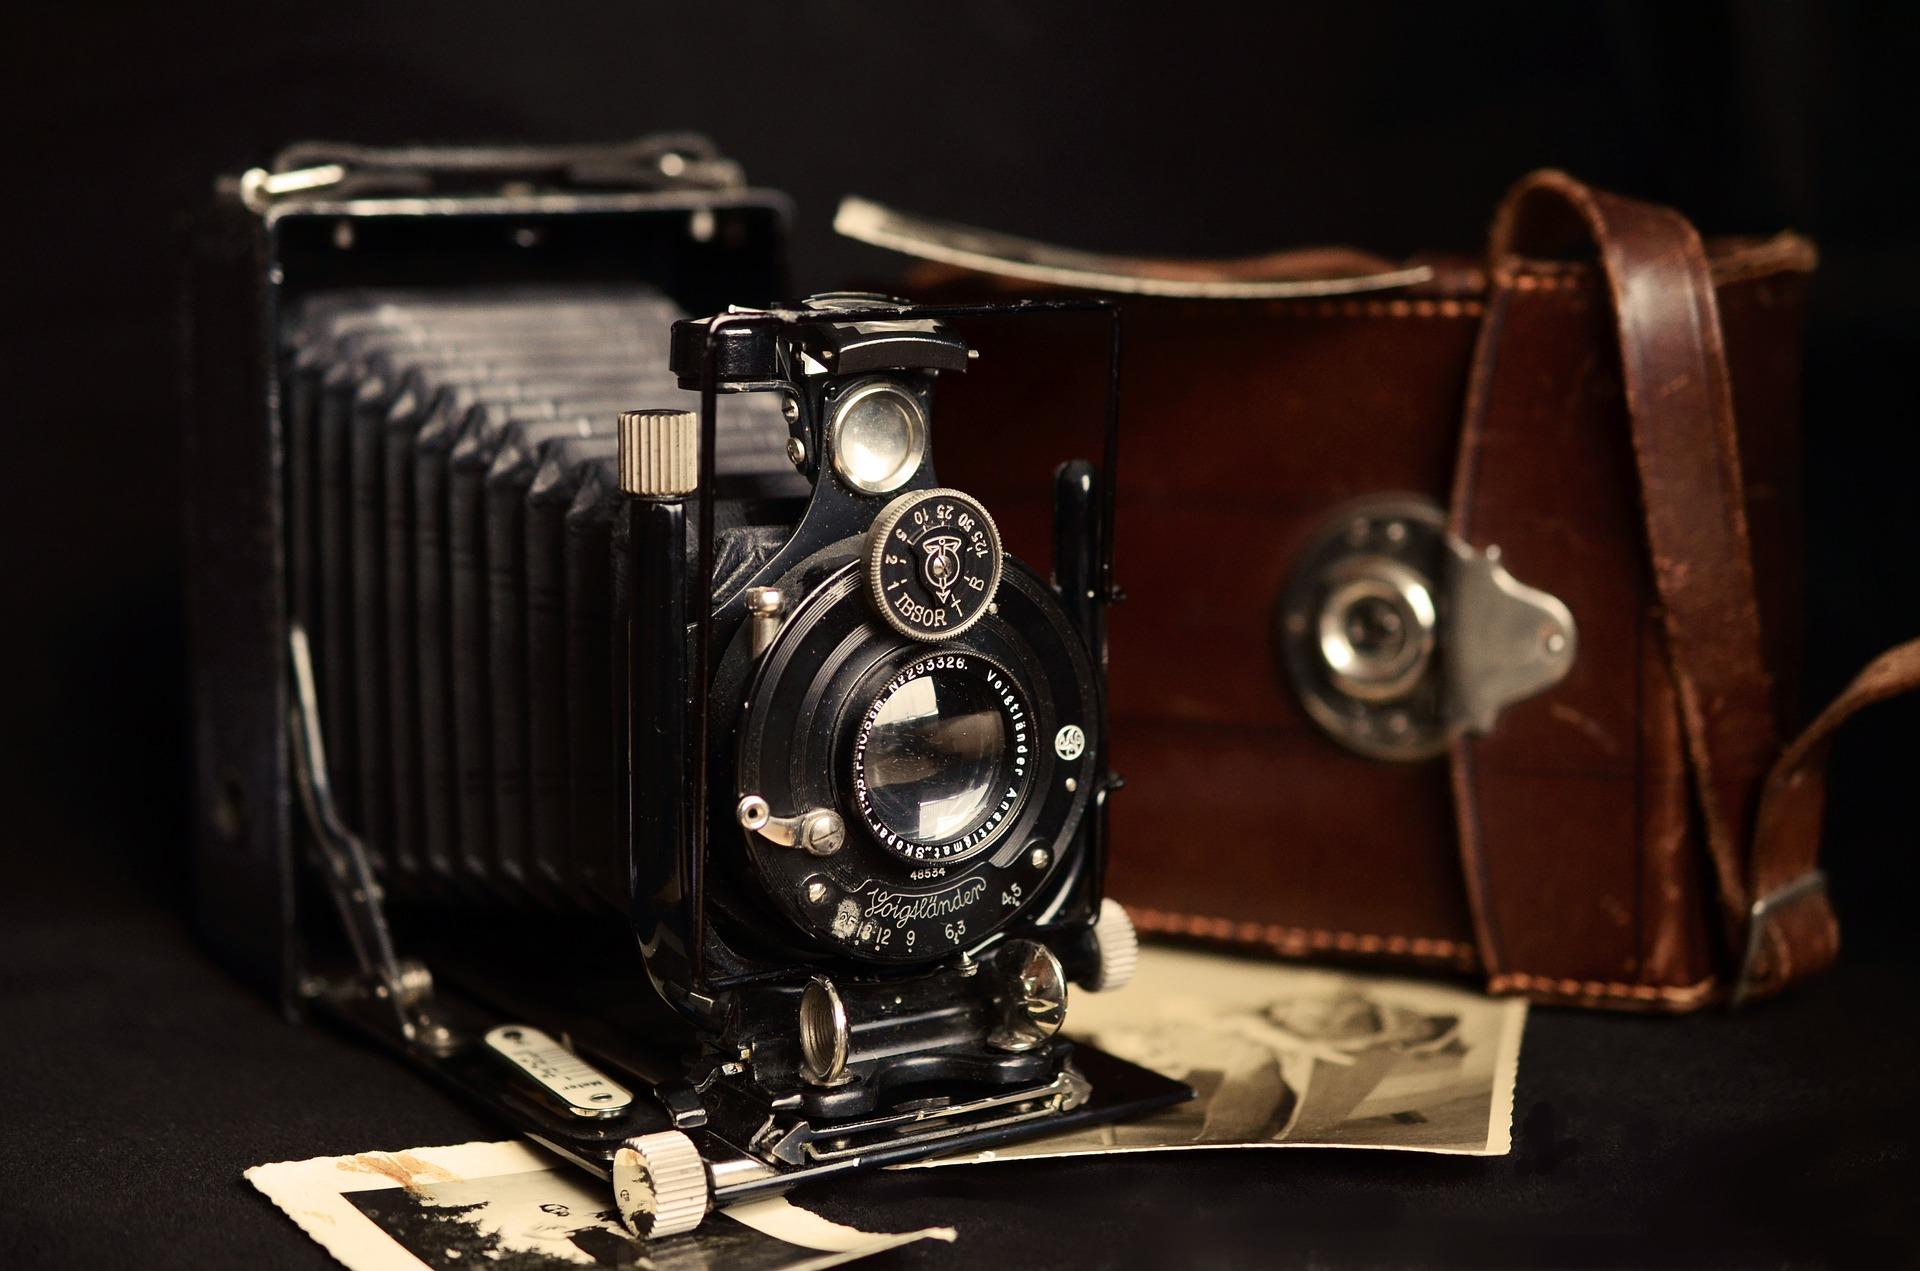 camera-711025_1920